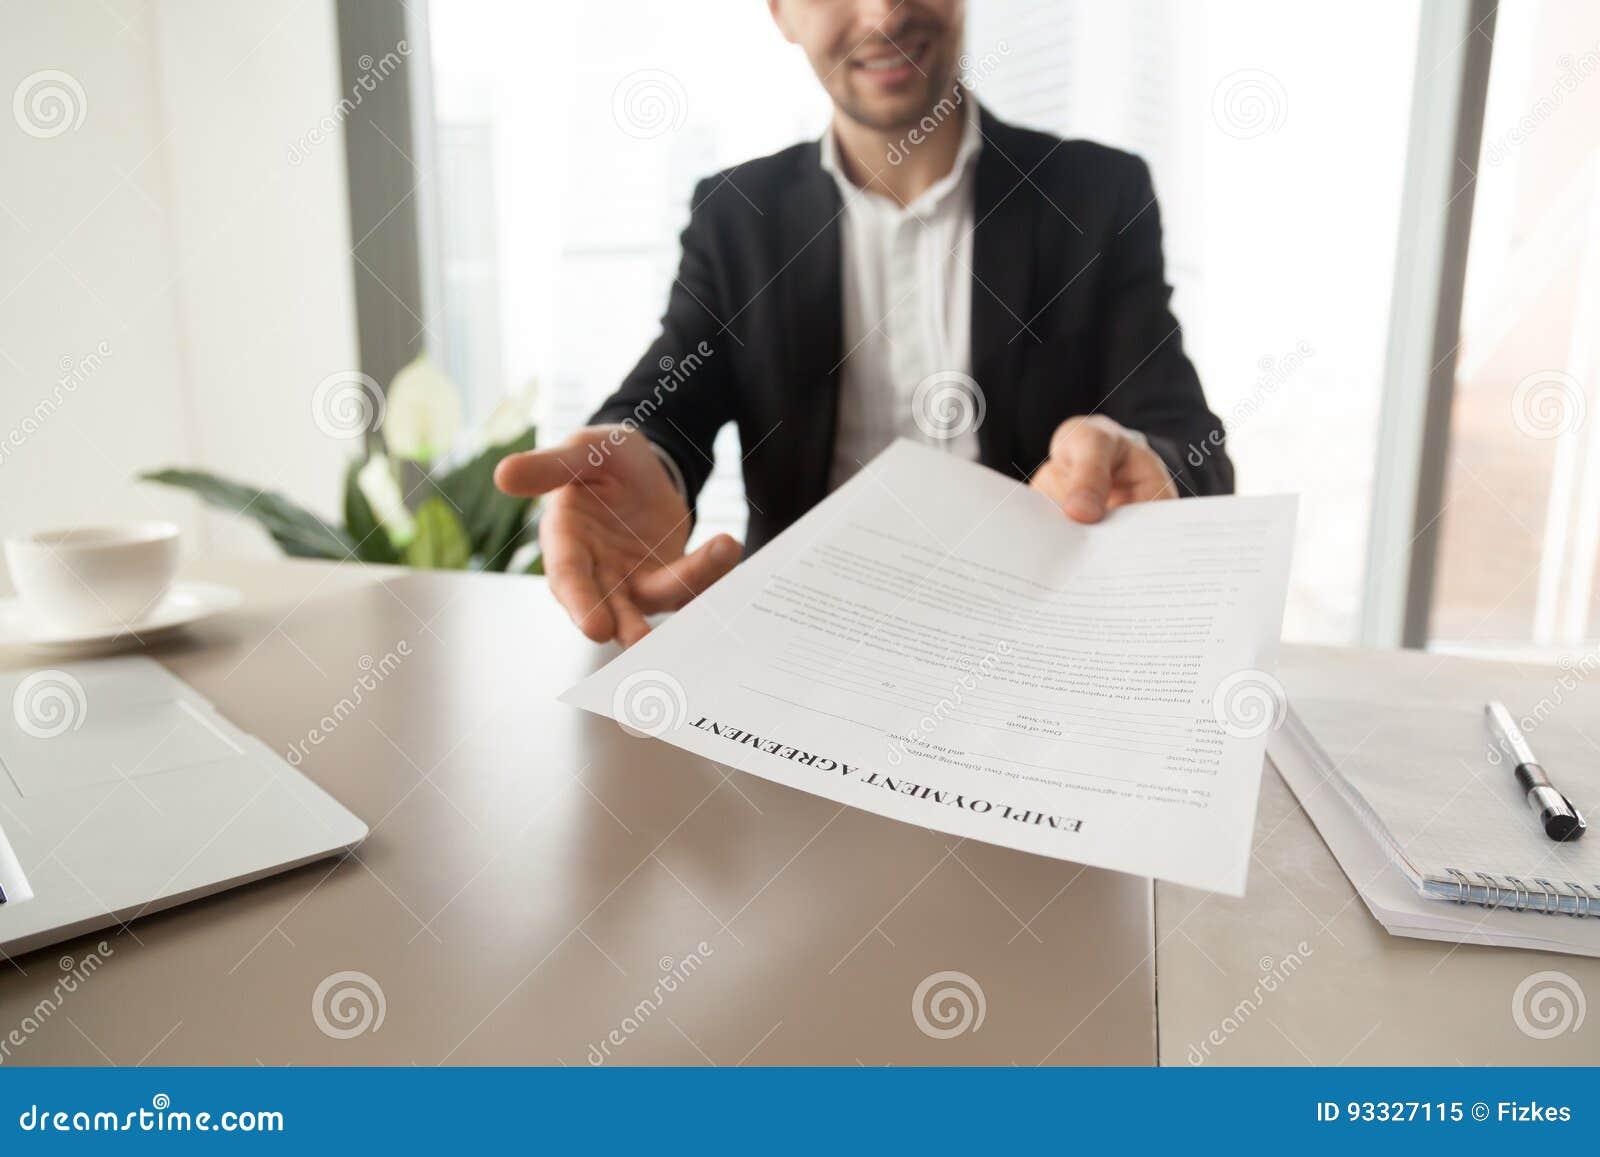 Recruitment manager offers employment agreement